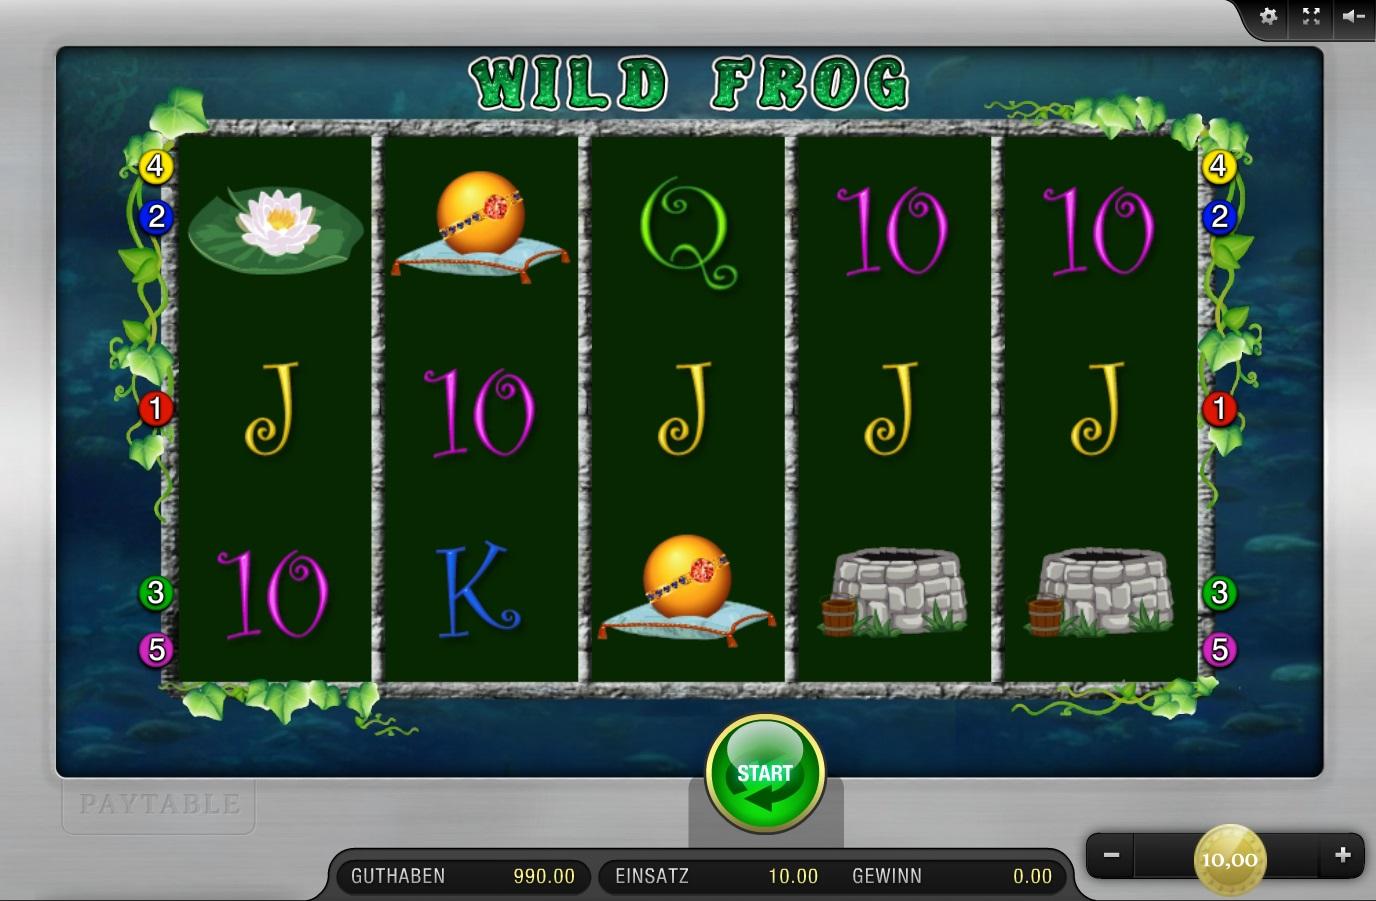 merkur casino online spielen jetztspielen de account löschen